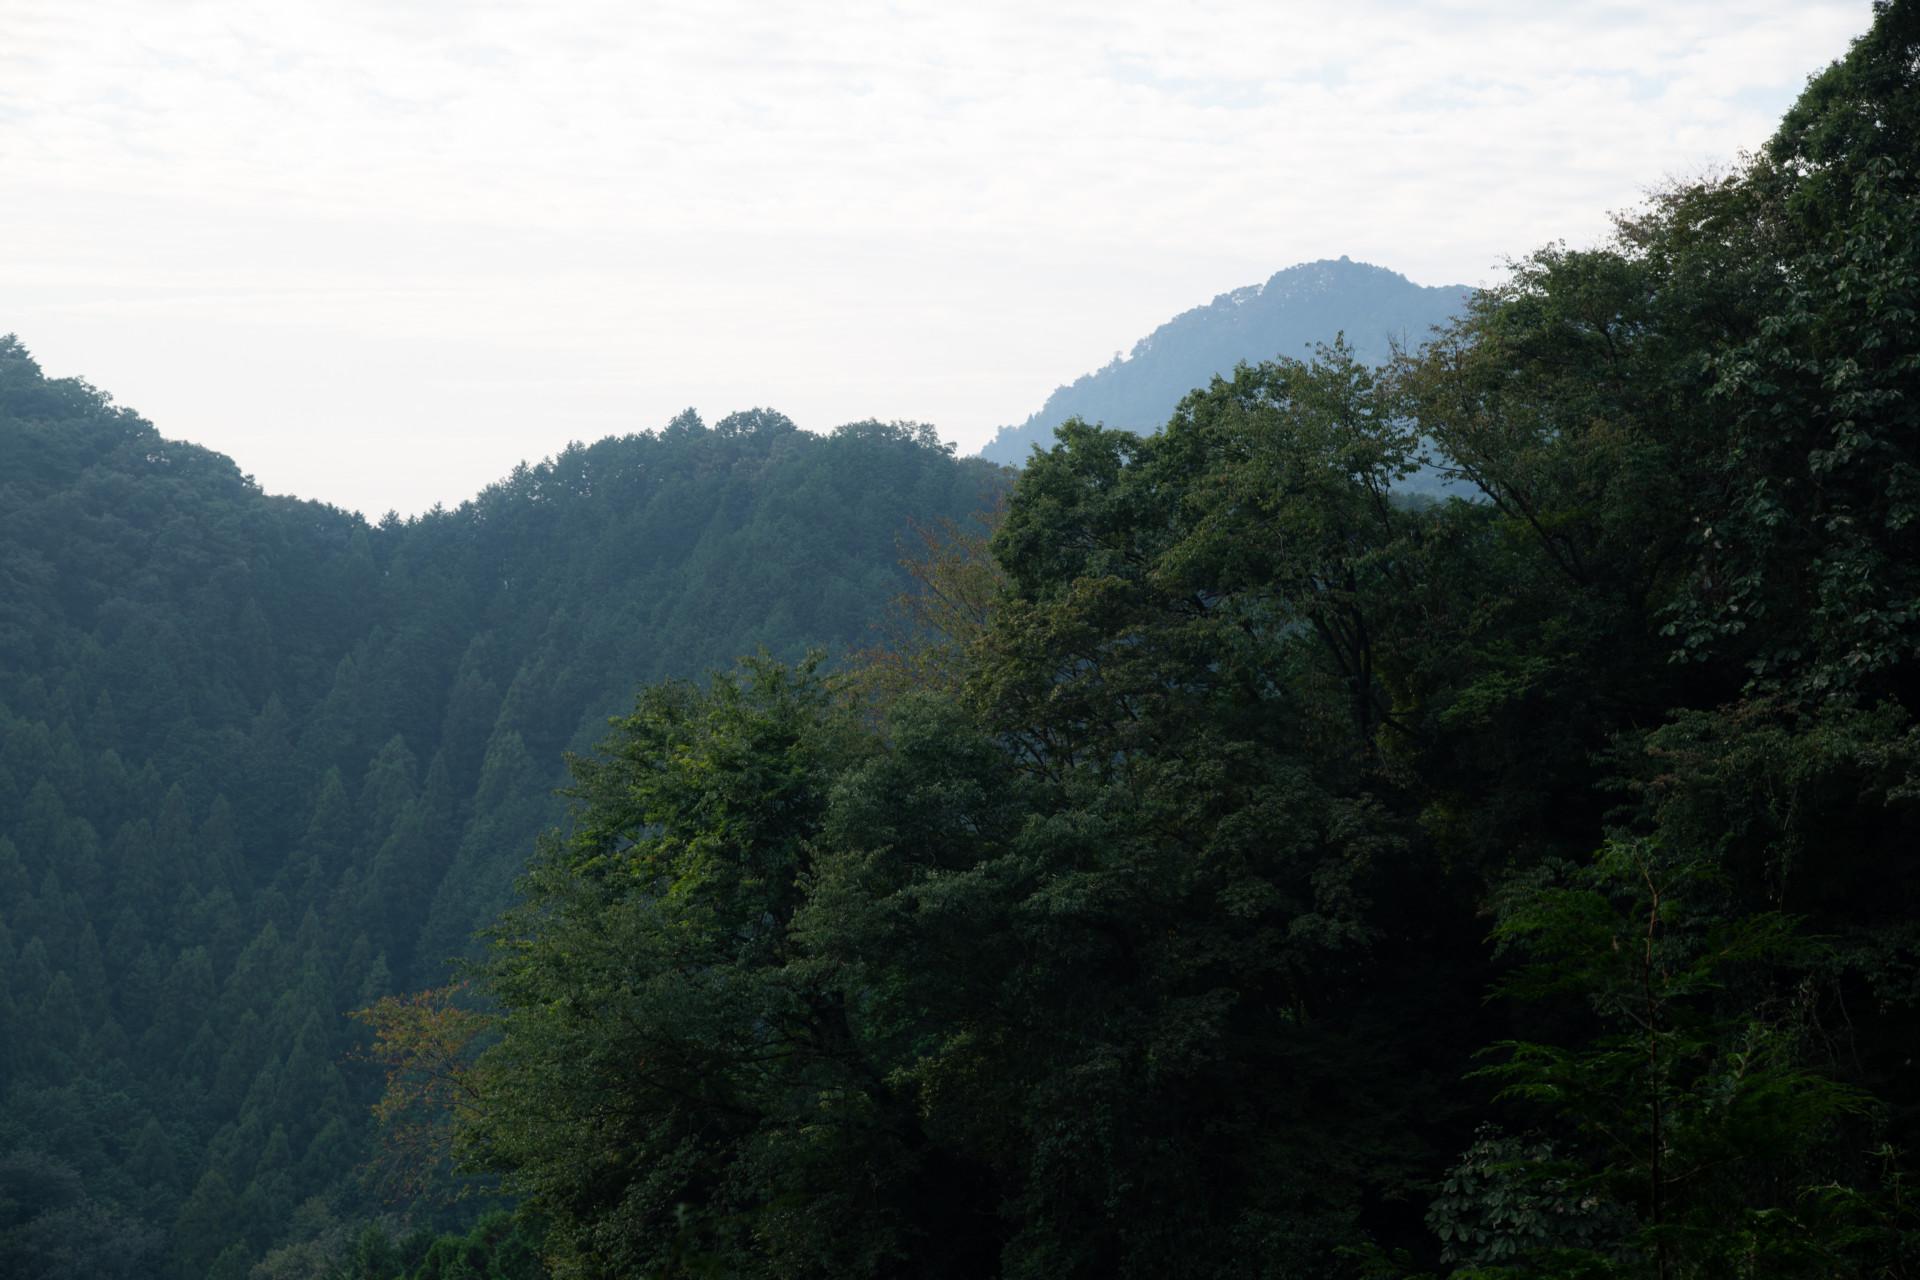 DSC_7952 登山録 今熊山(八王子市上川町)